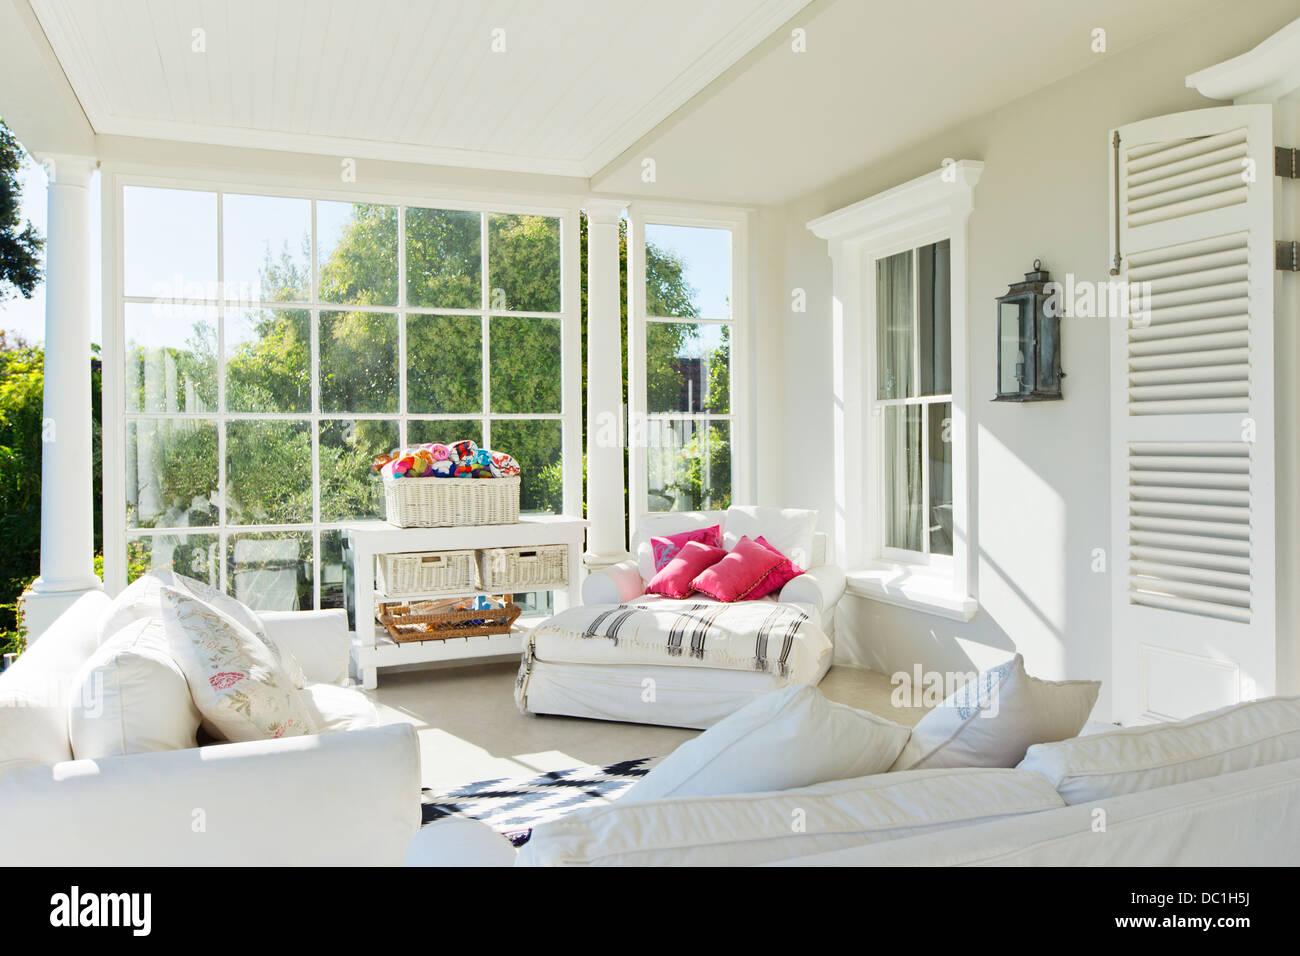 Luxury sun porch - Stock Image